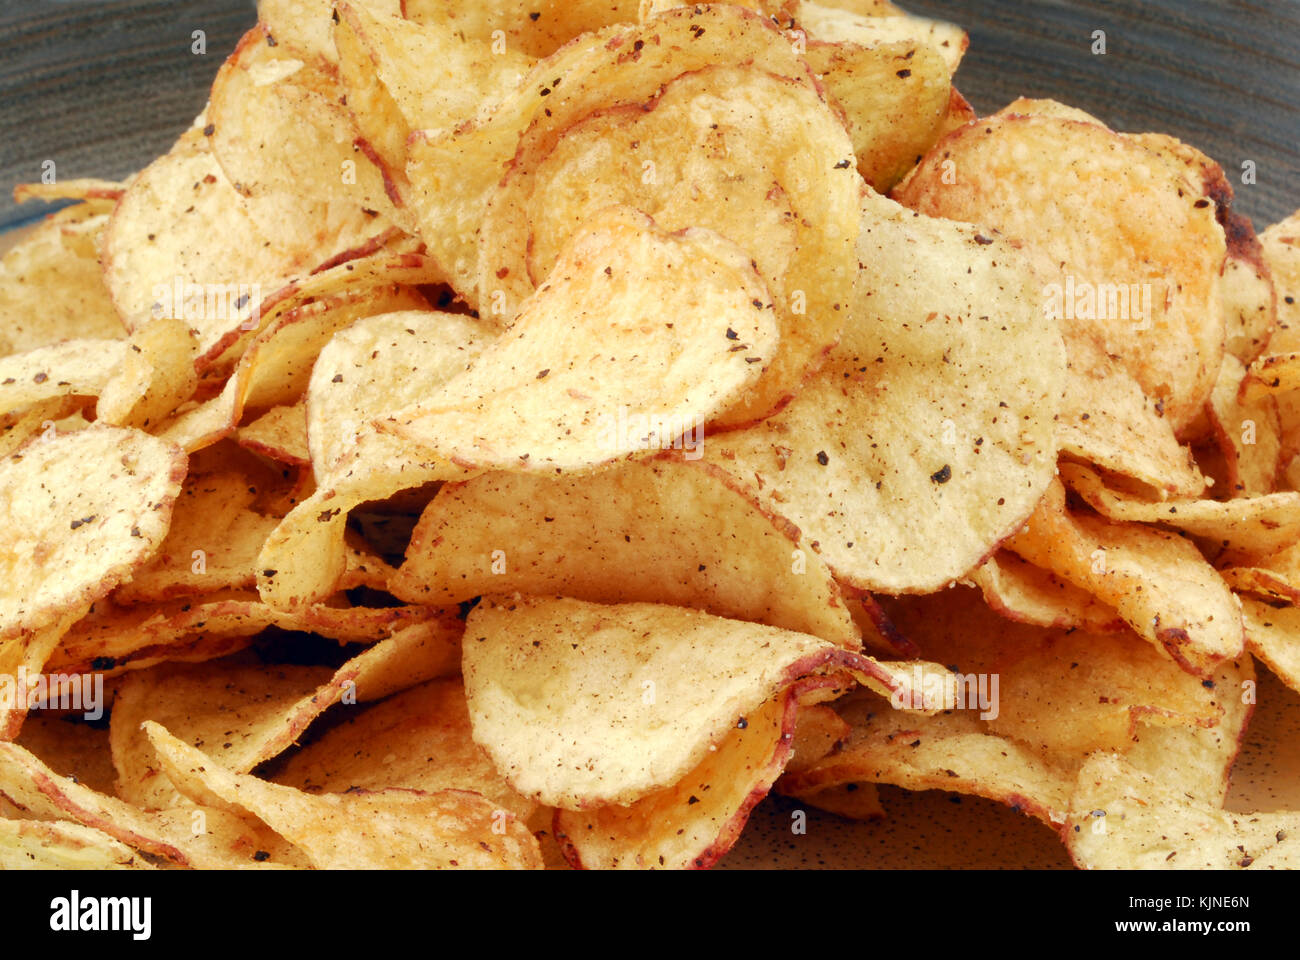 chips crisps on plate - Stock Image